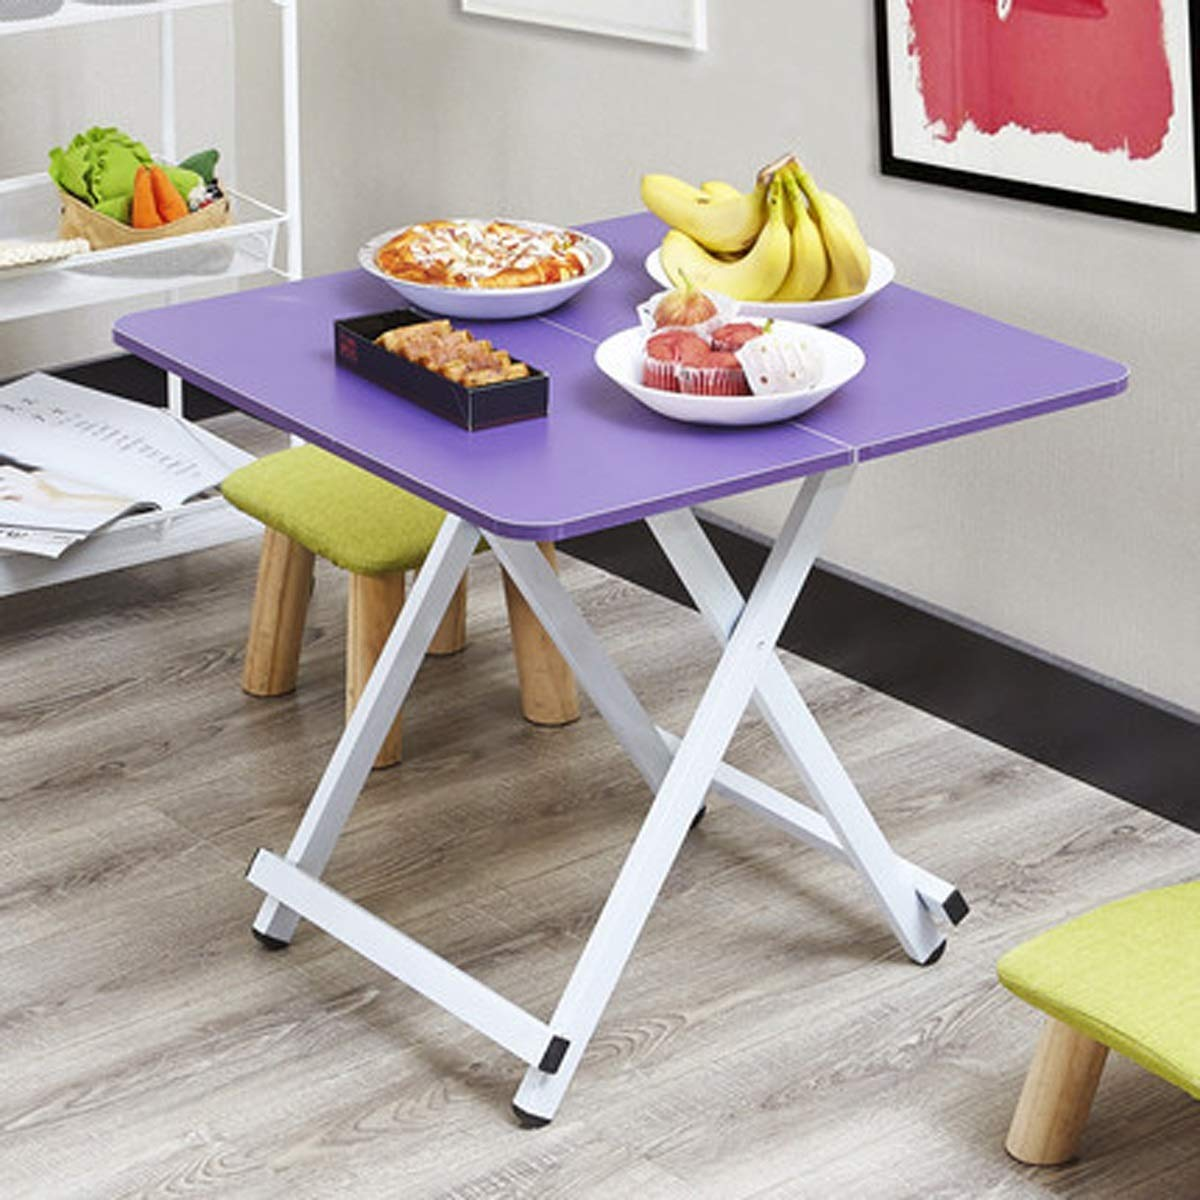 Baianju Folding Table Portable Picnic Table Outdoor Portable Table Family Folding Table Multifunctional Small Table by Baianju